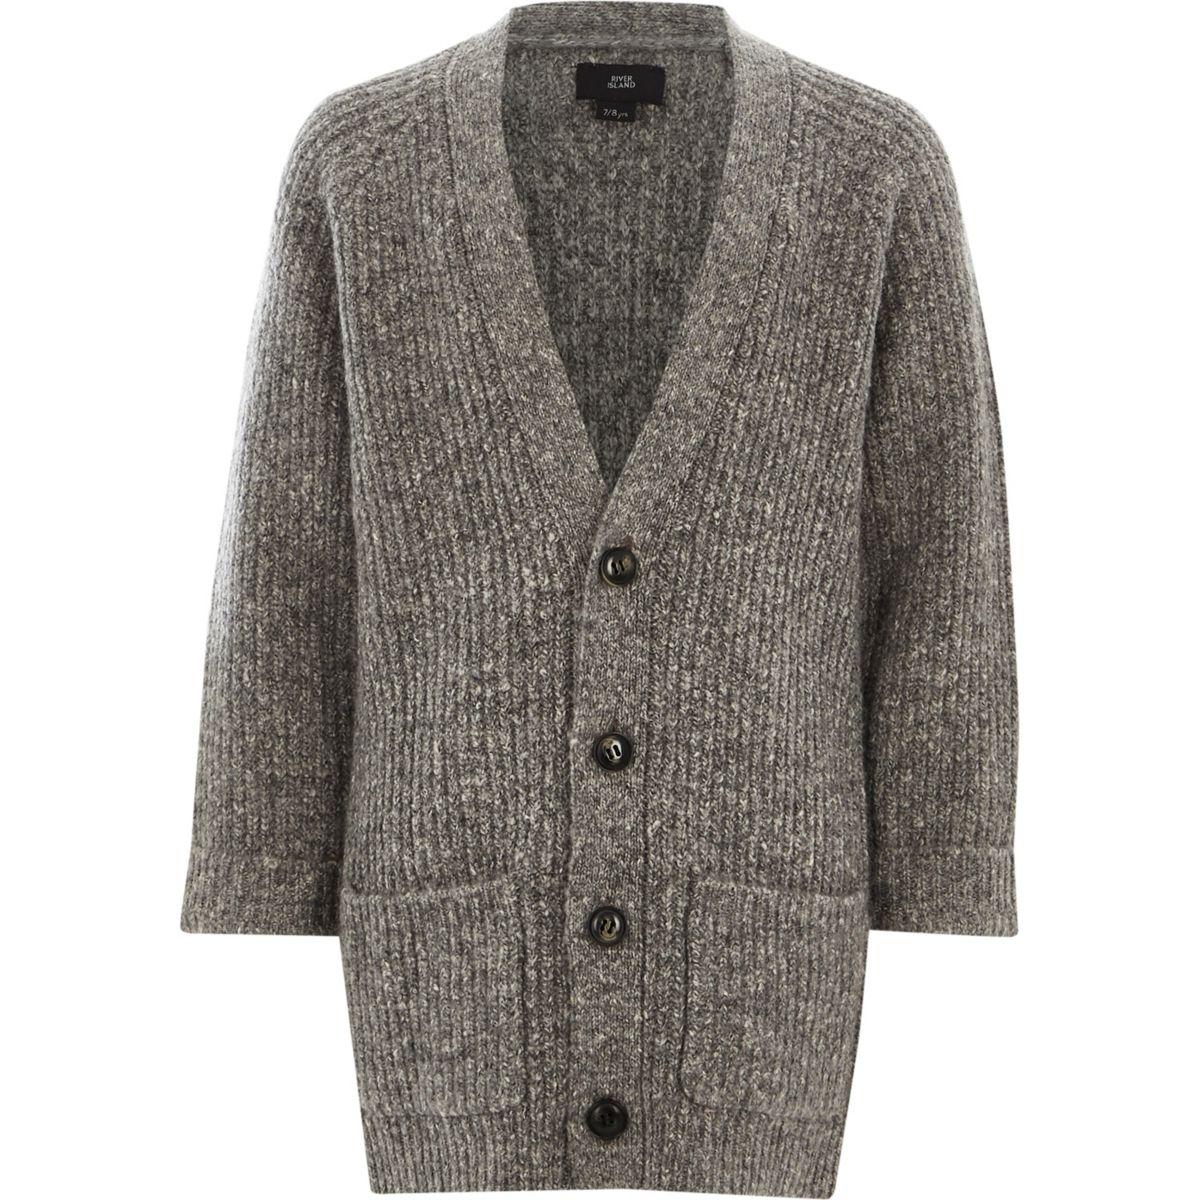 Boys grey chunky knit longline cardigan - Cardigans & Sweaters ...